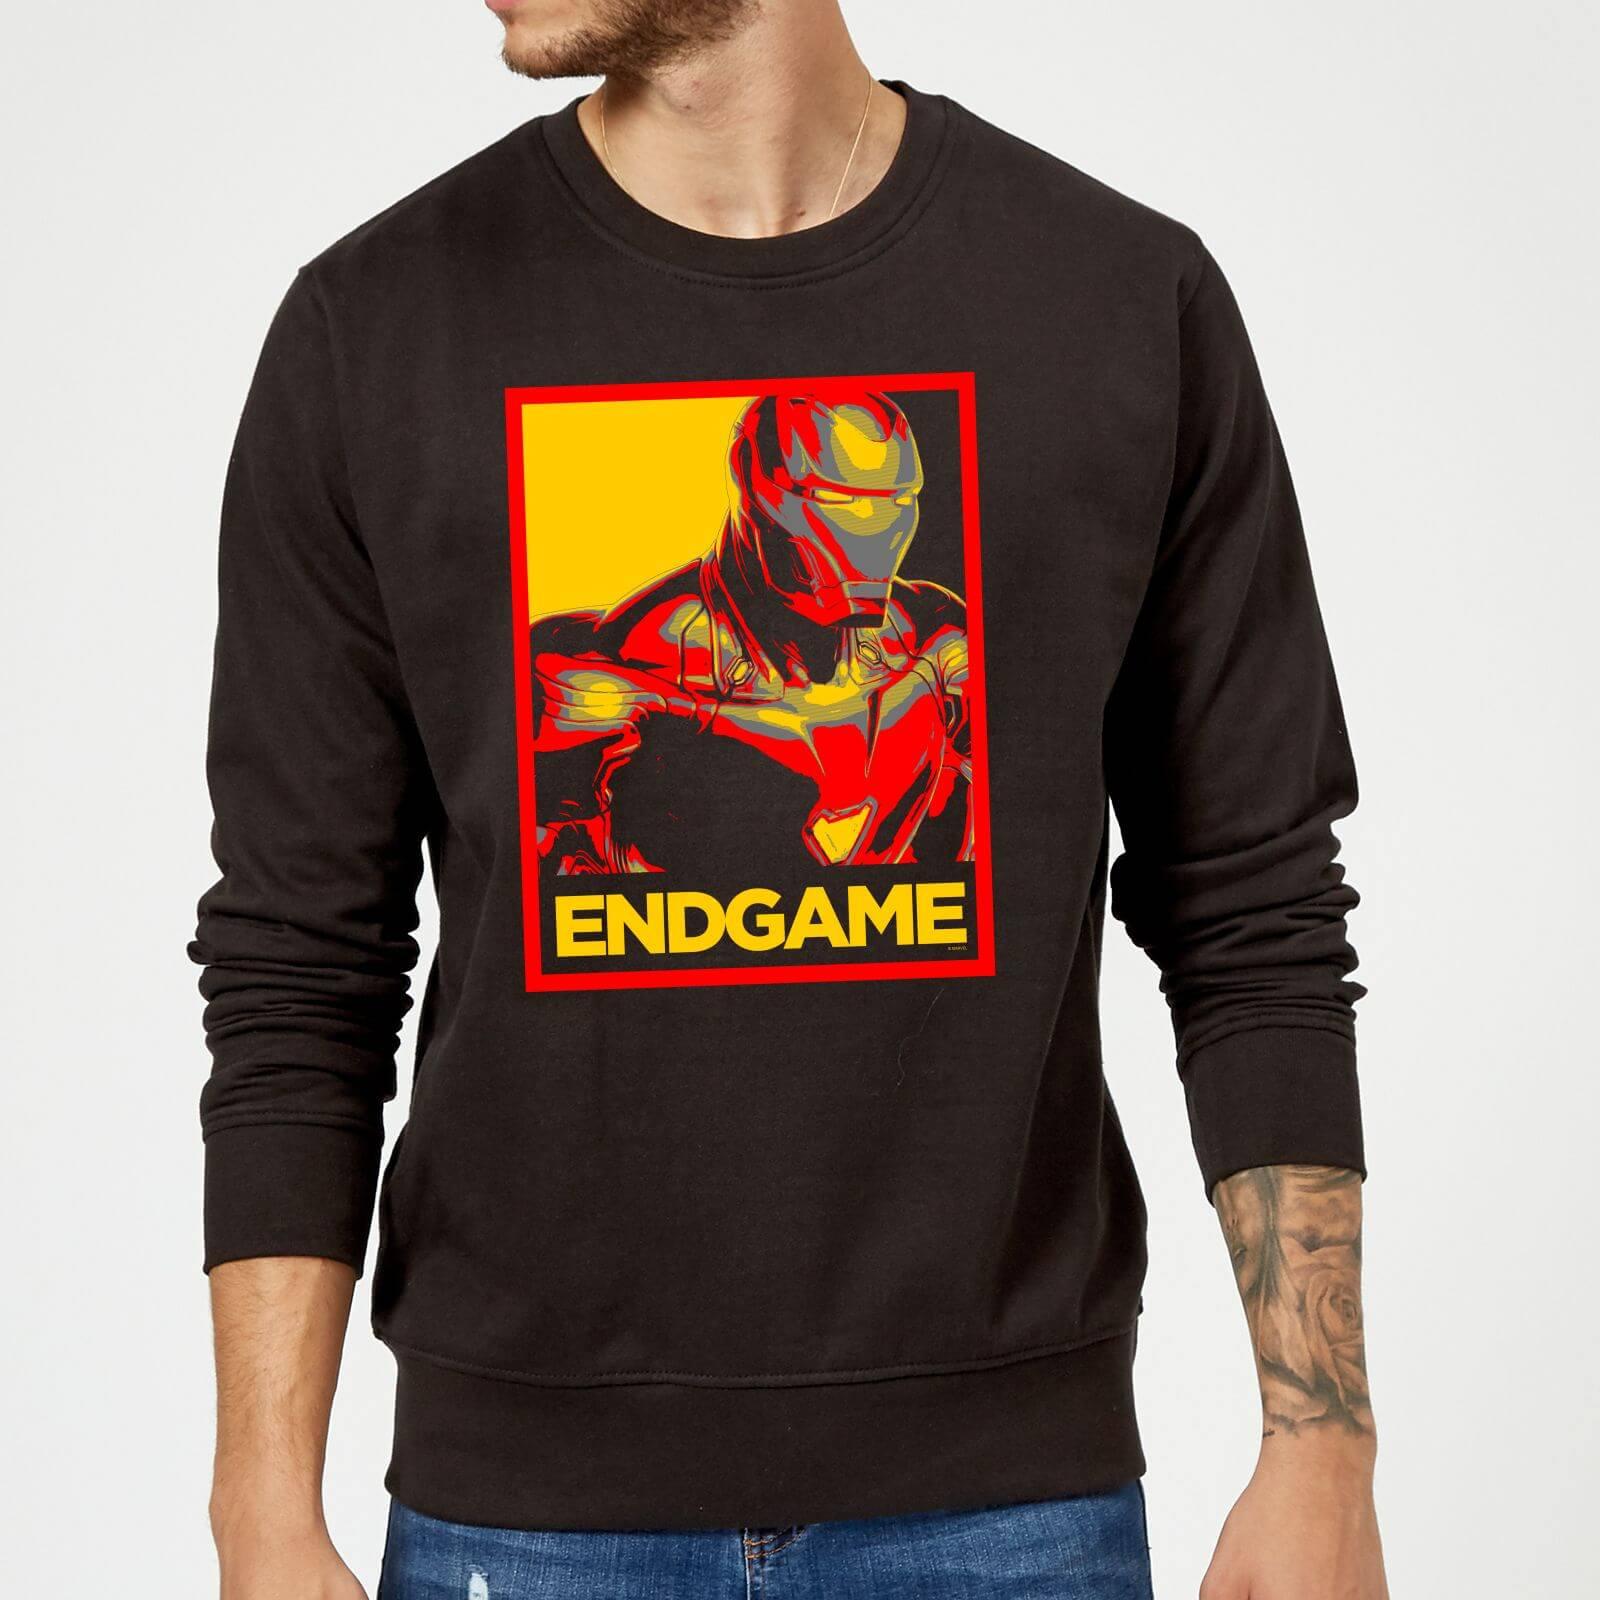 Marvel Avengers Endgame Iron Man Poster Sweatshirt - Black - XXL - Black